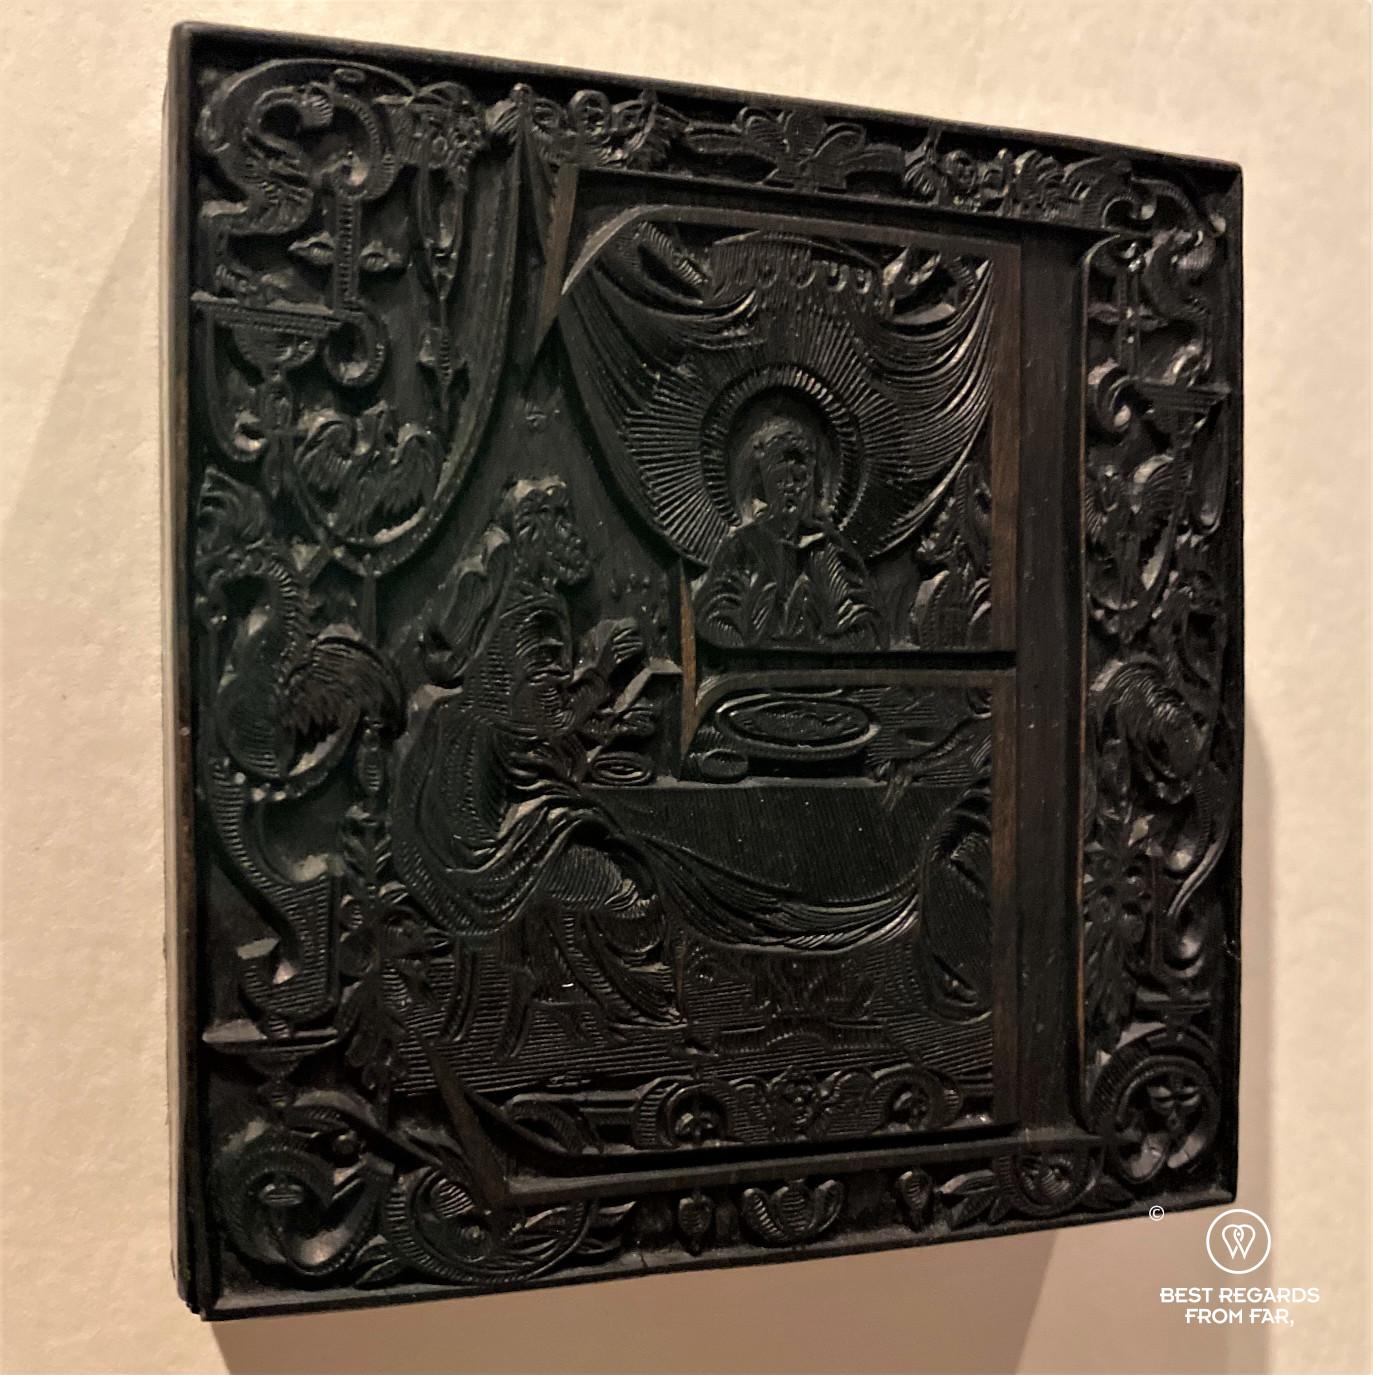 Woodblock used for printing, Plantin Moretus Museum in Antwerp